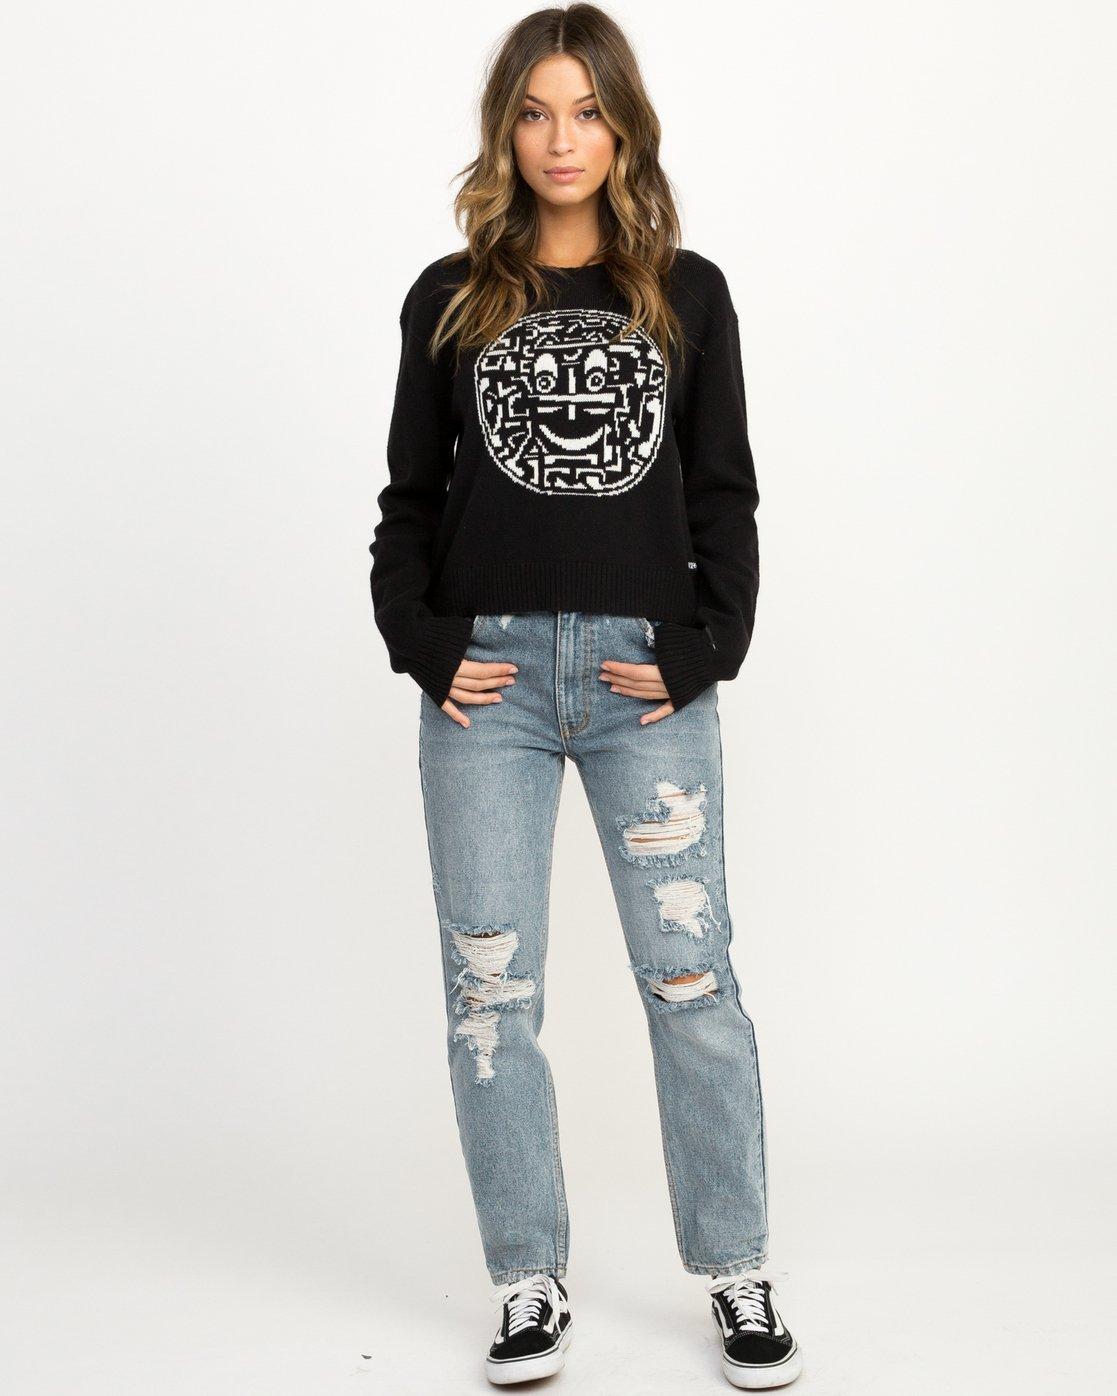 3 Joe Grillo Smiles Sweater Black WV07QRSM RVCA